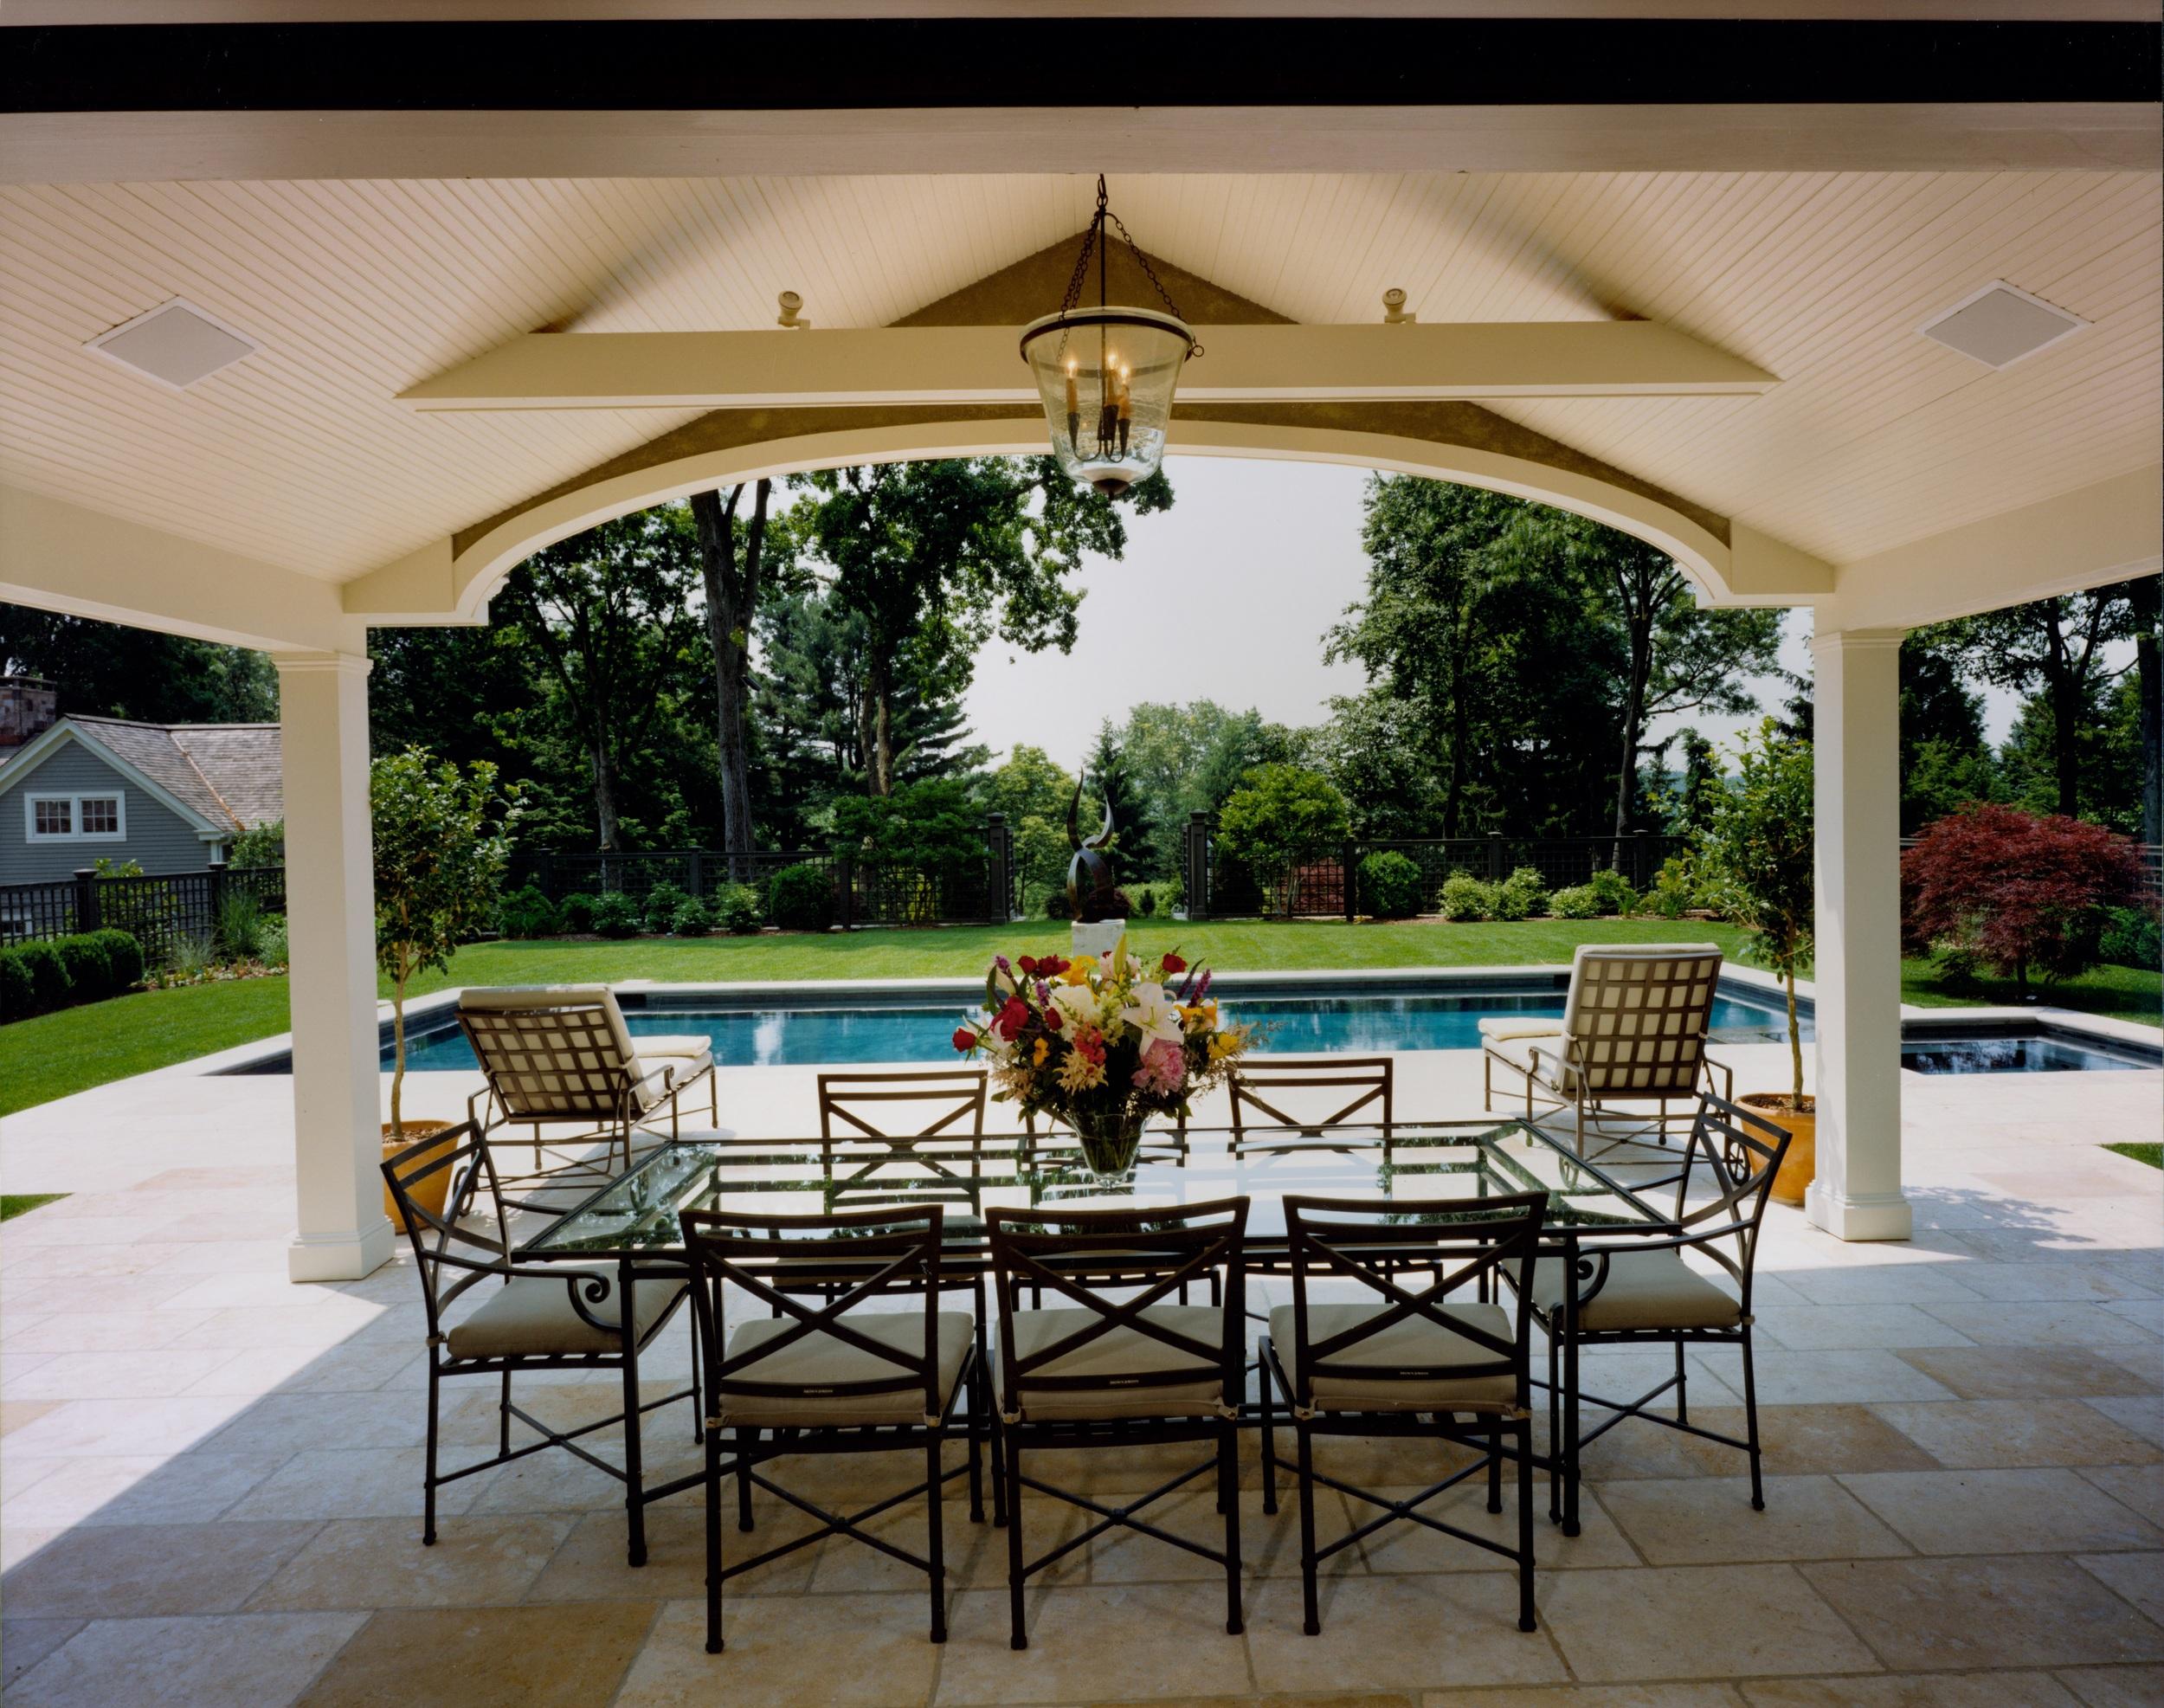 Pool House Terrace.jpg